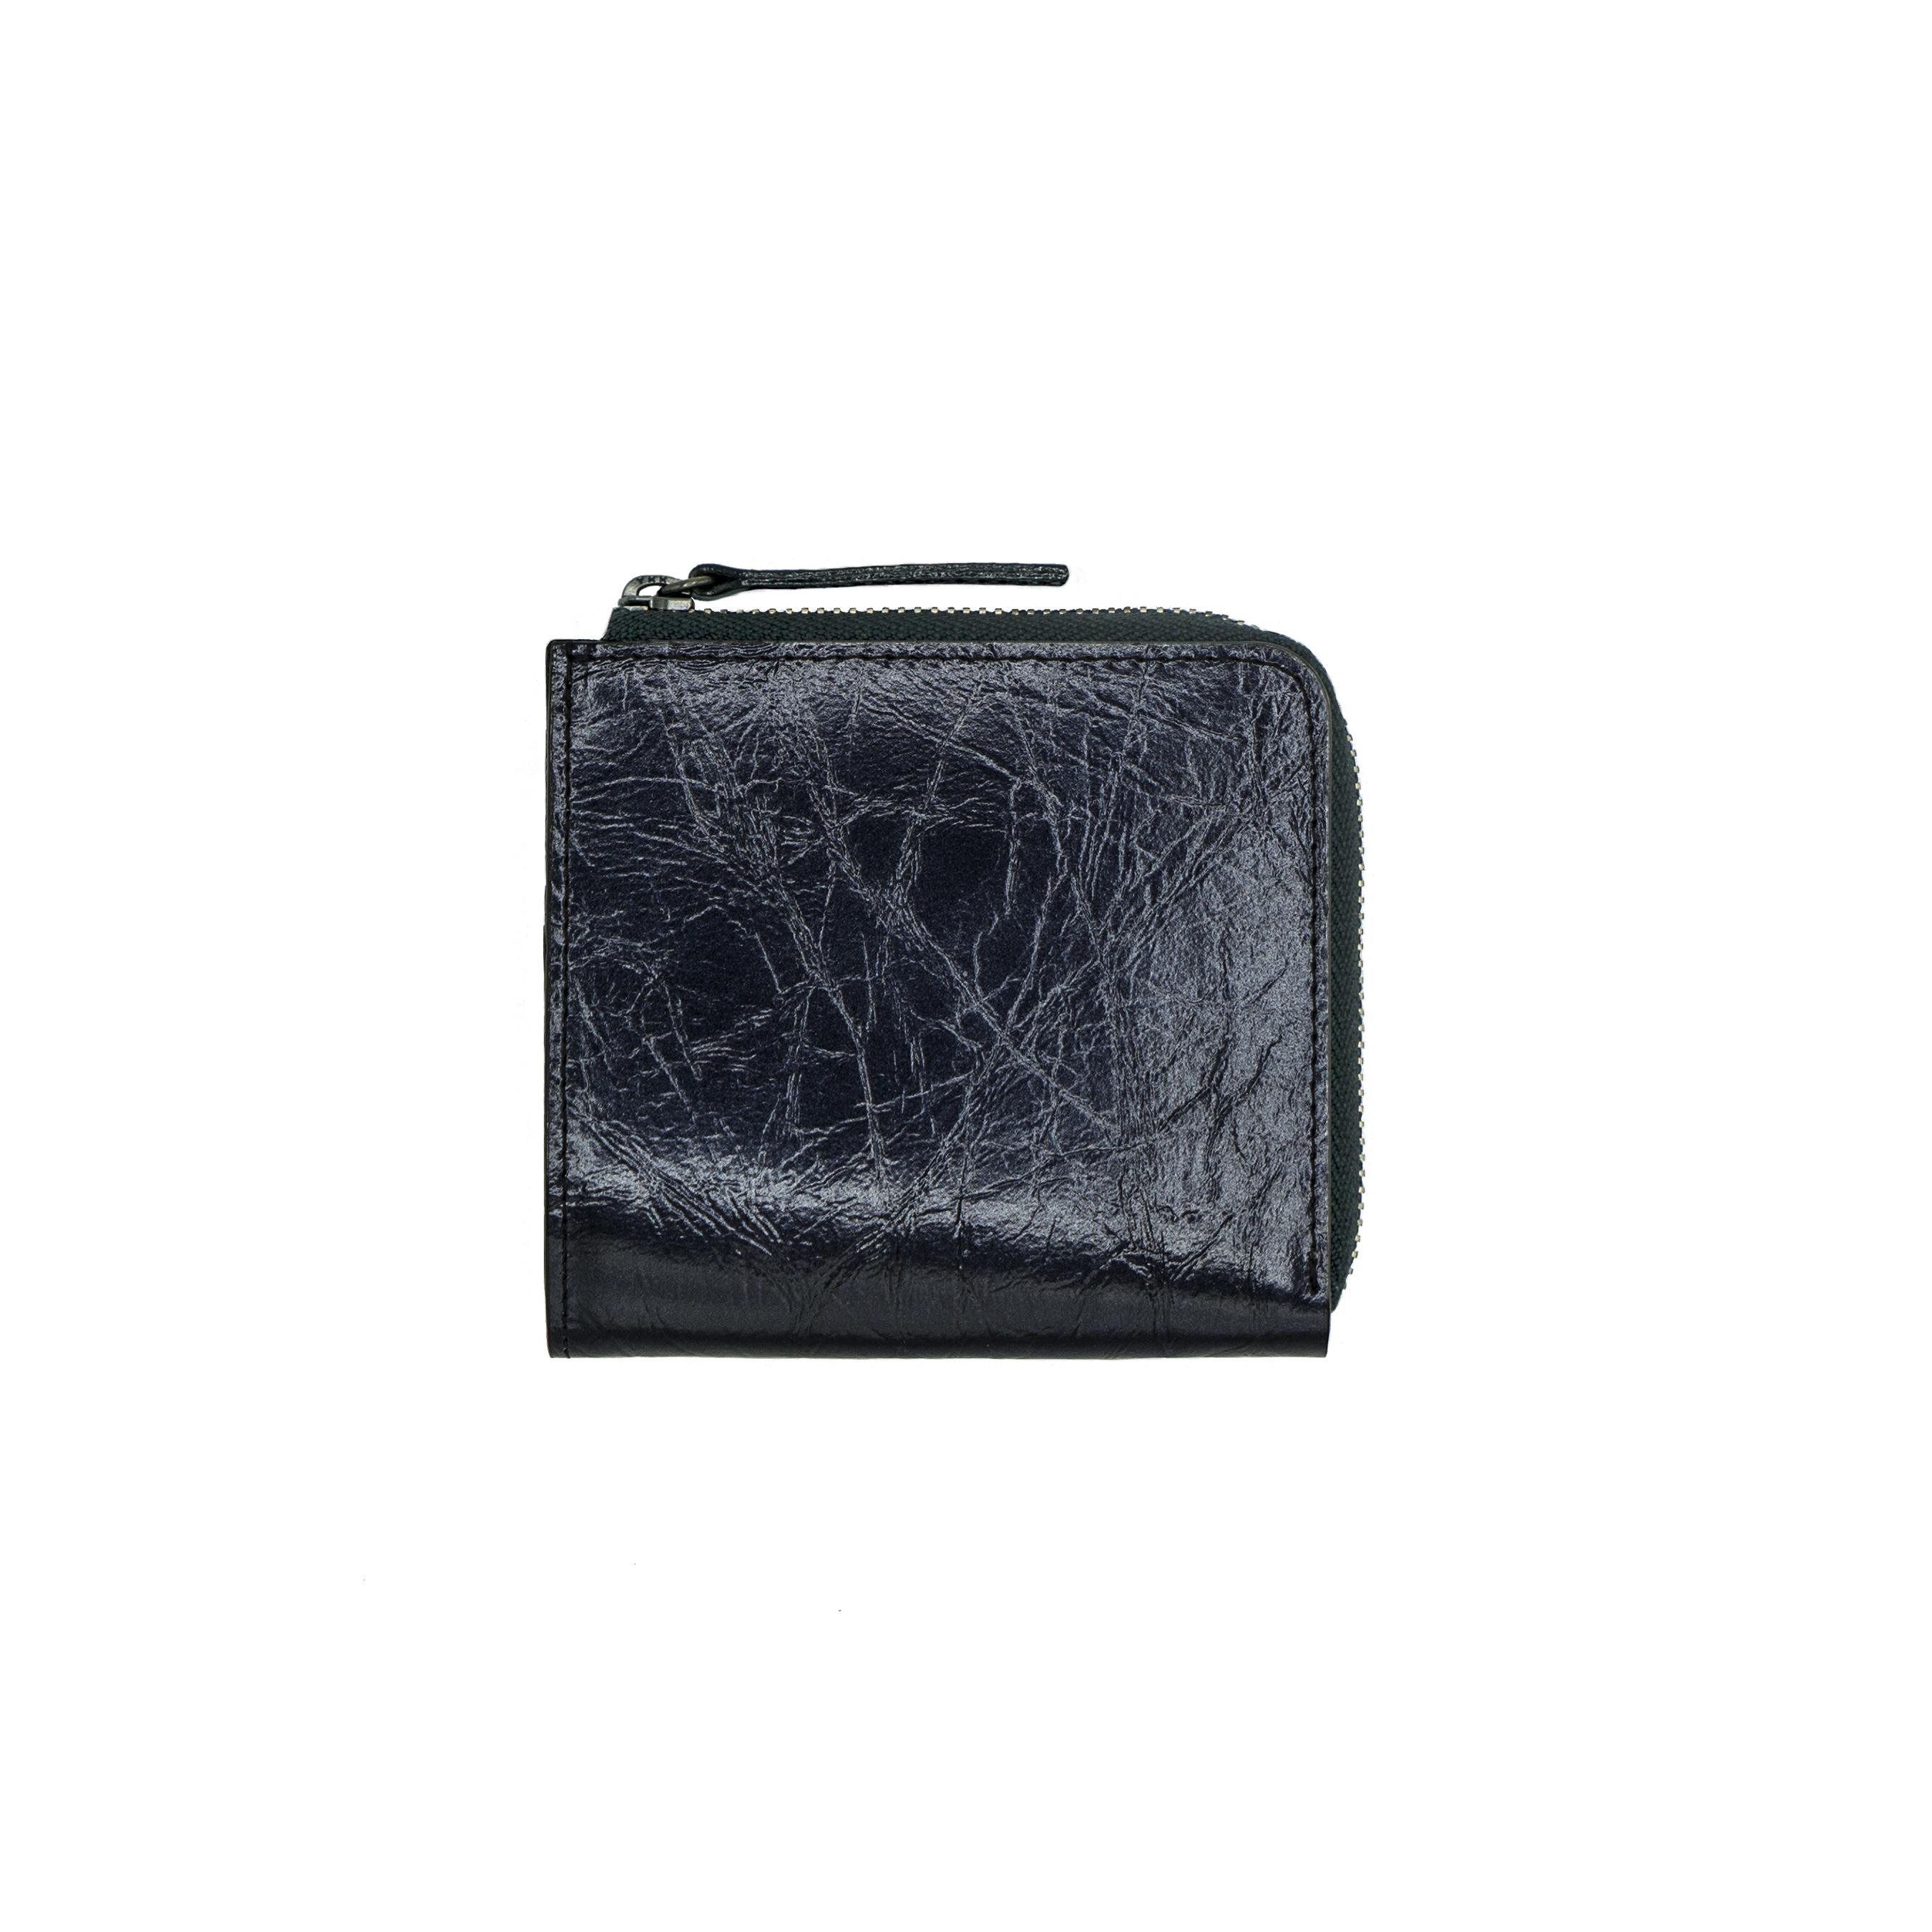 《財布S》TIN BREATH Small purse Midnight black